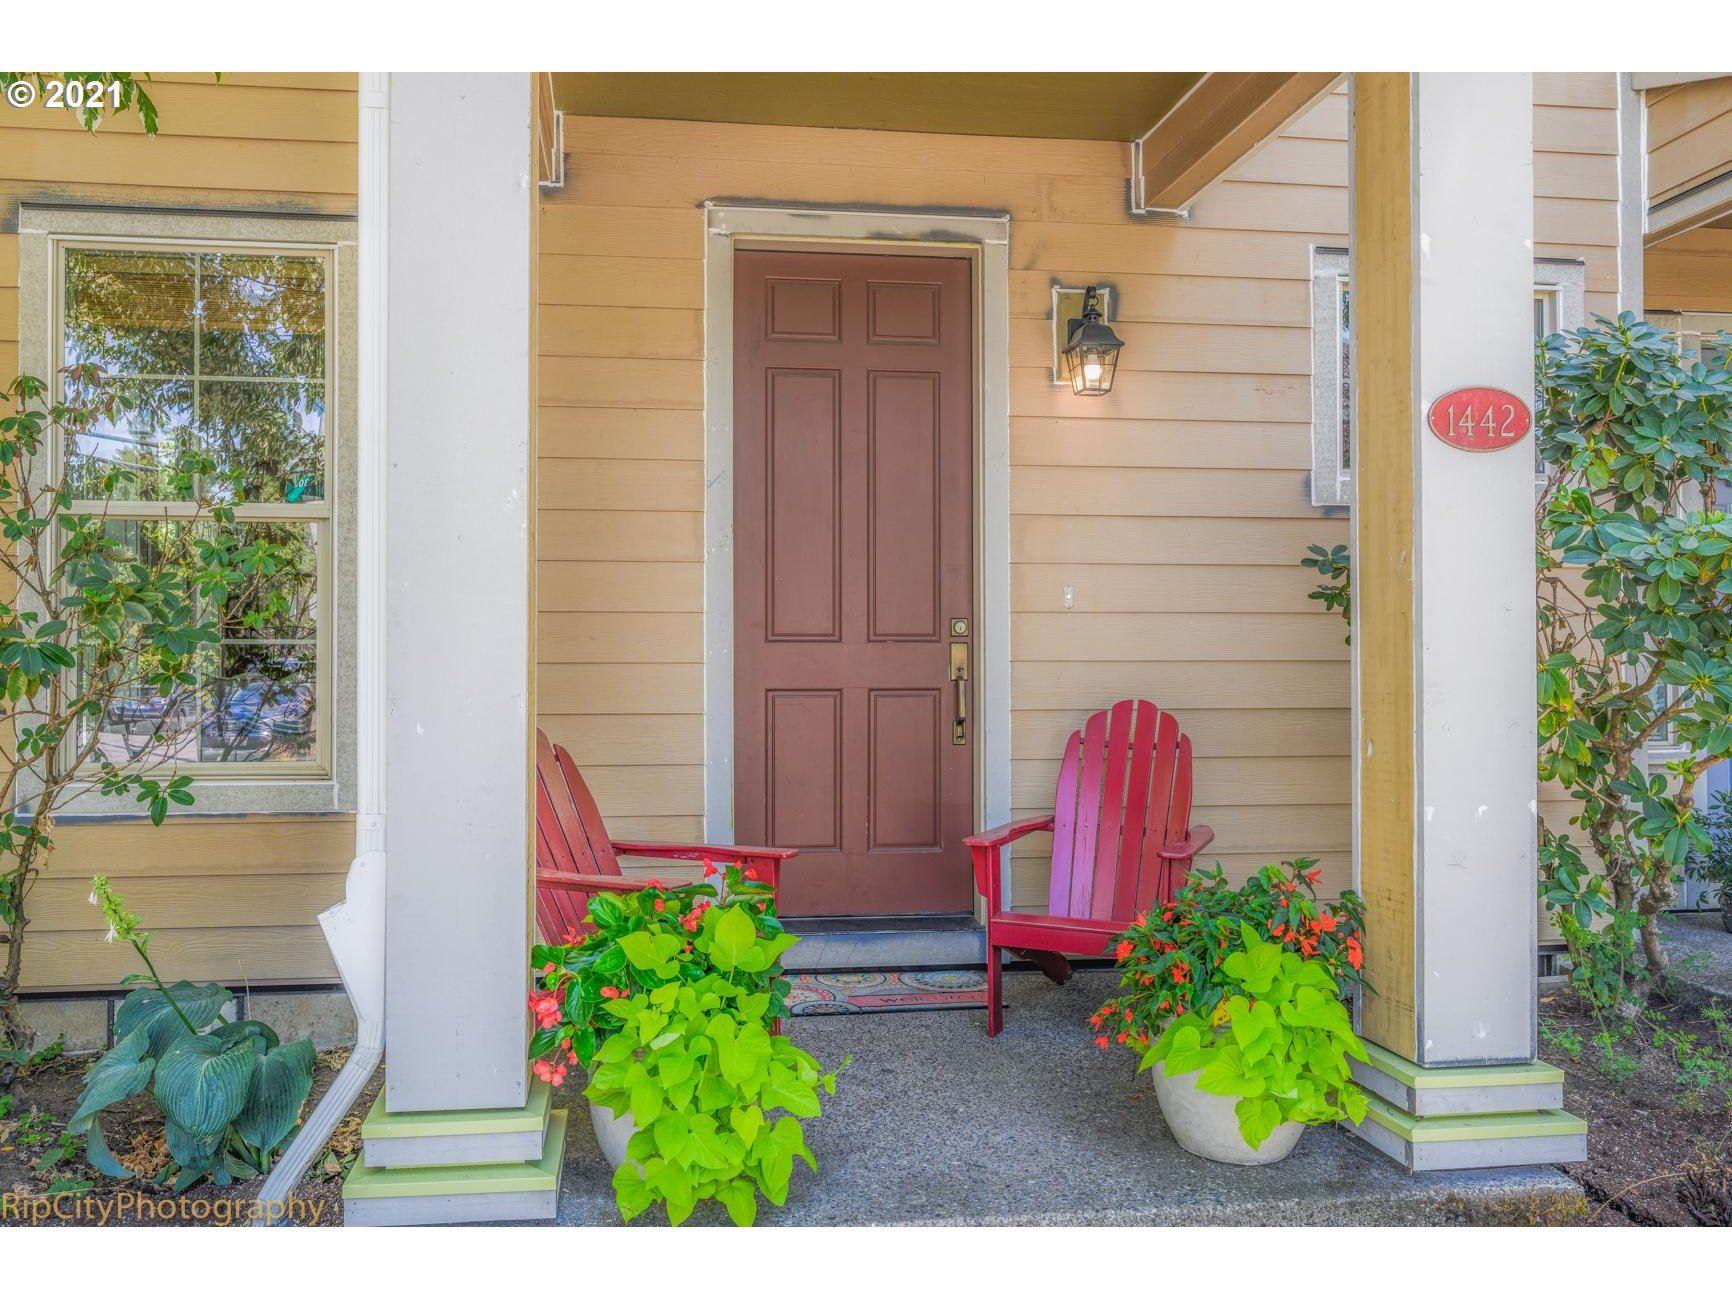 1442 SE UMATILLA ST, Portland, OR 97202 - MLS#: 21102058